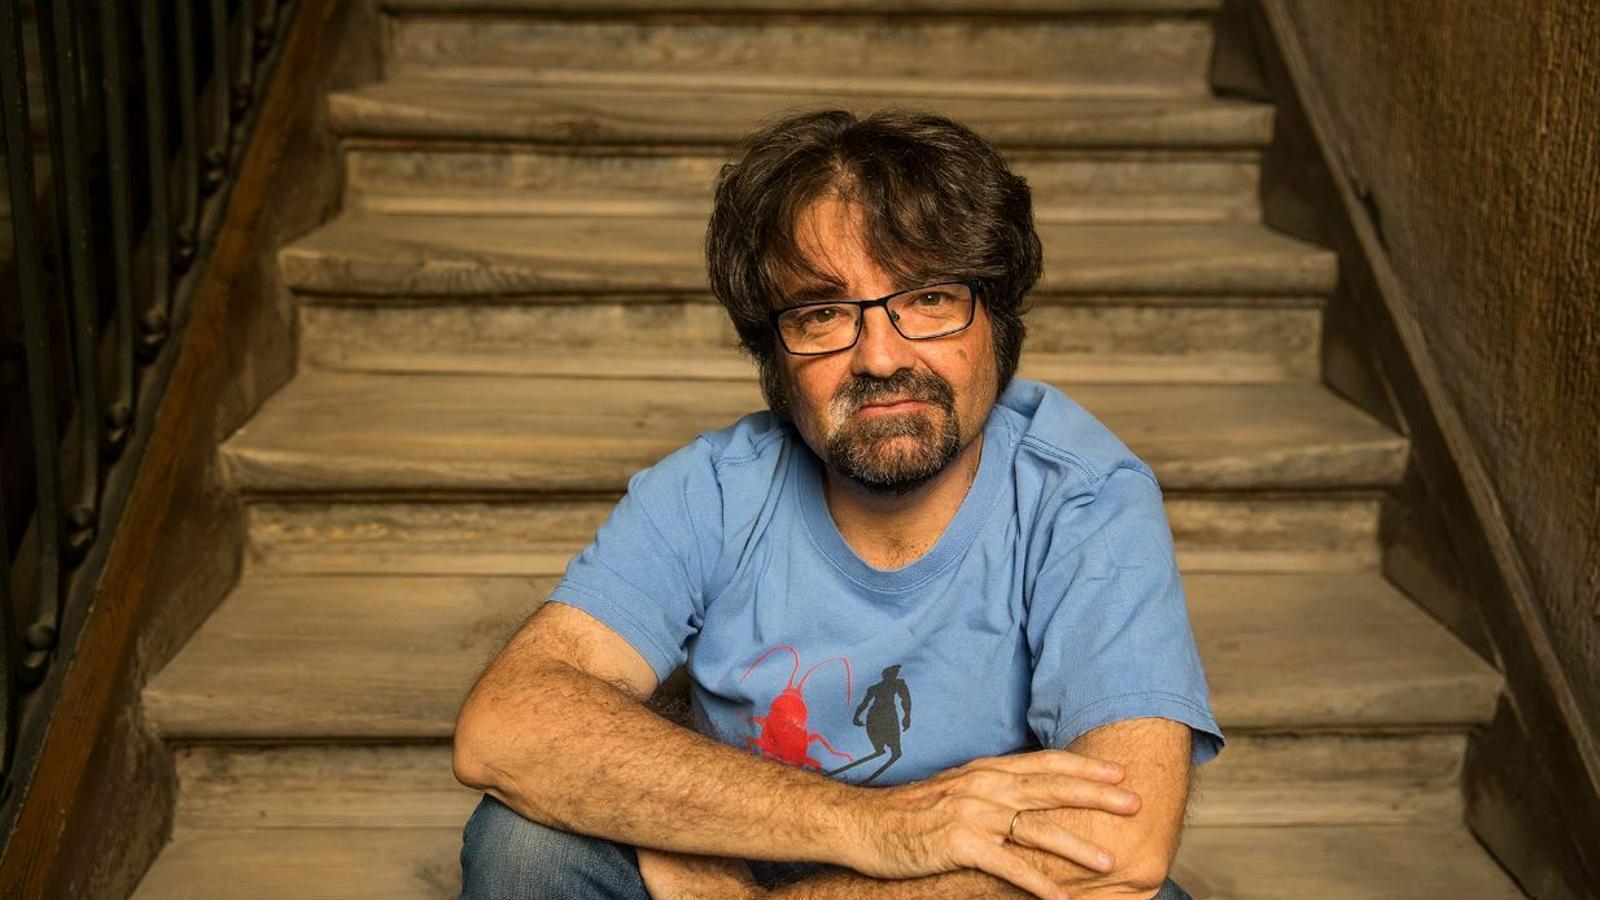 Juan Casamayor és l'editor de Páginas de espuma